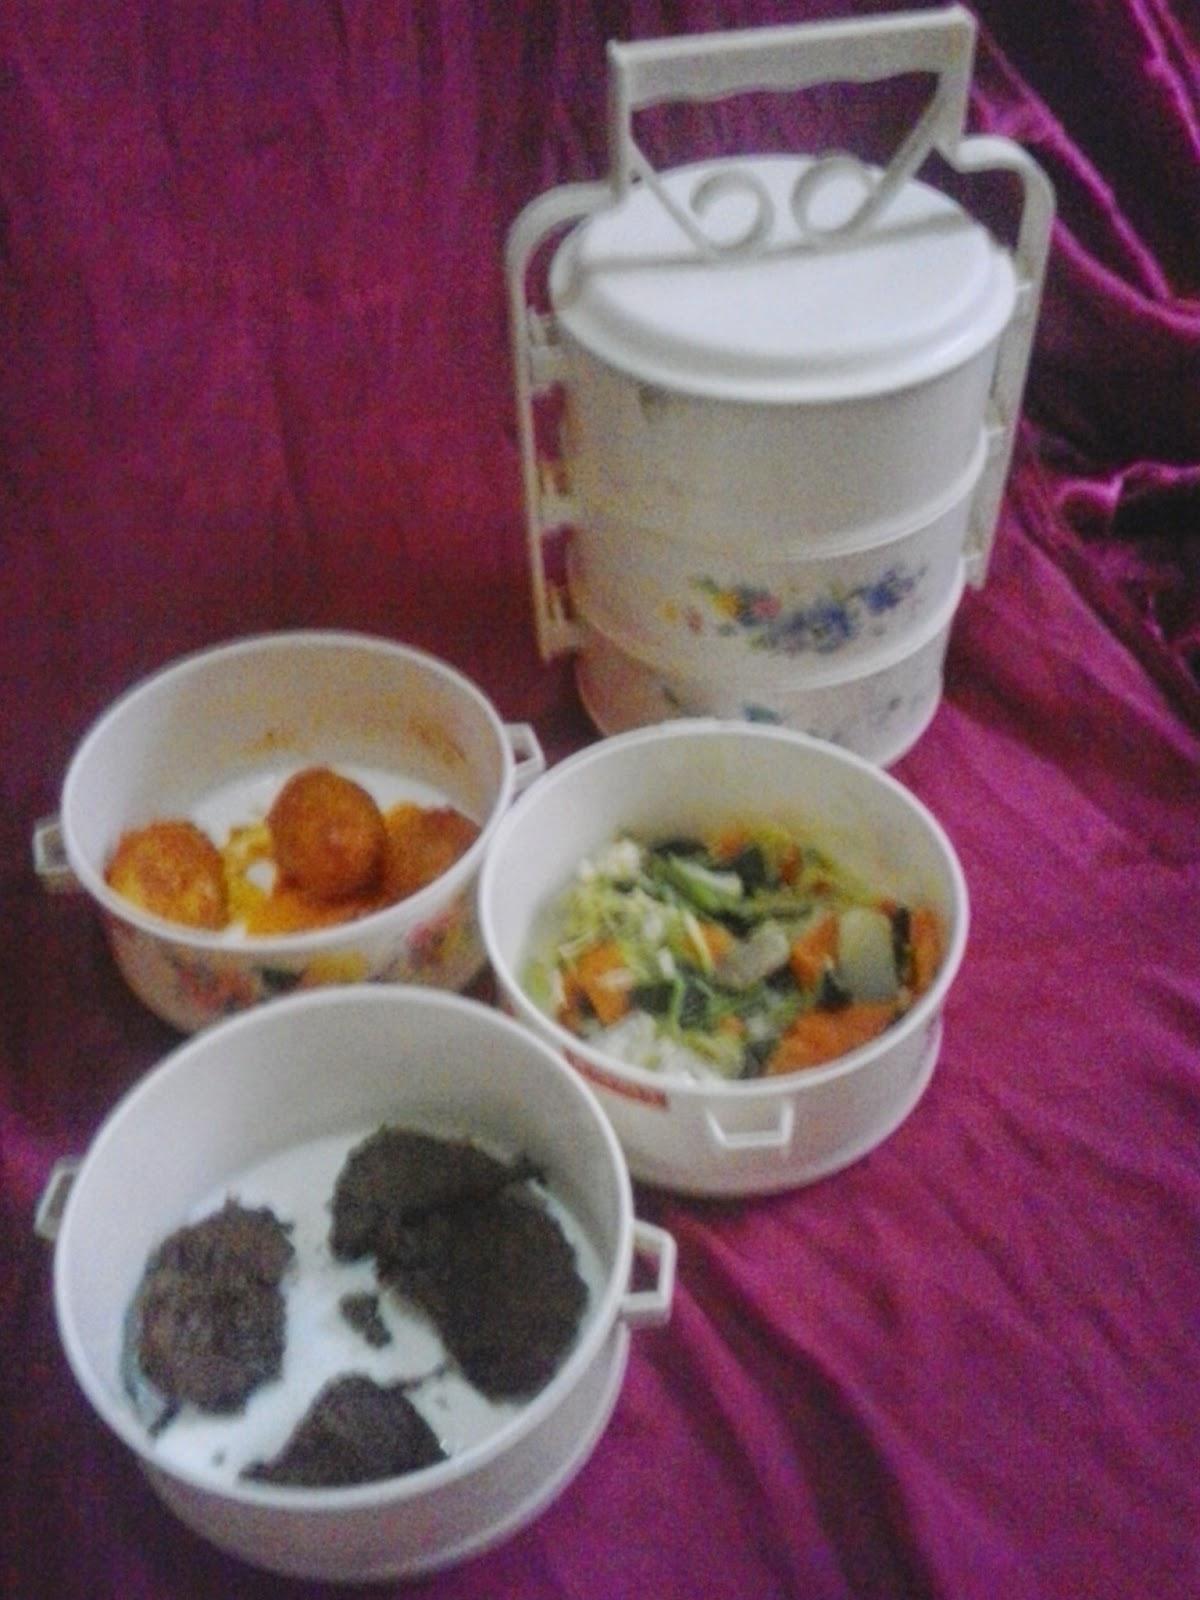 Catering Rumahan | Rantangan Murah | Rantangan Sehat | Rantangan Jakarta Barat